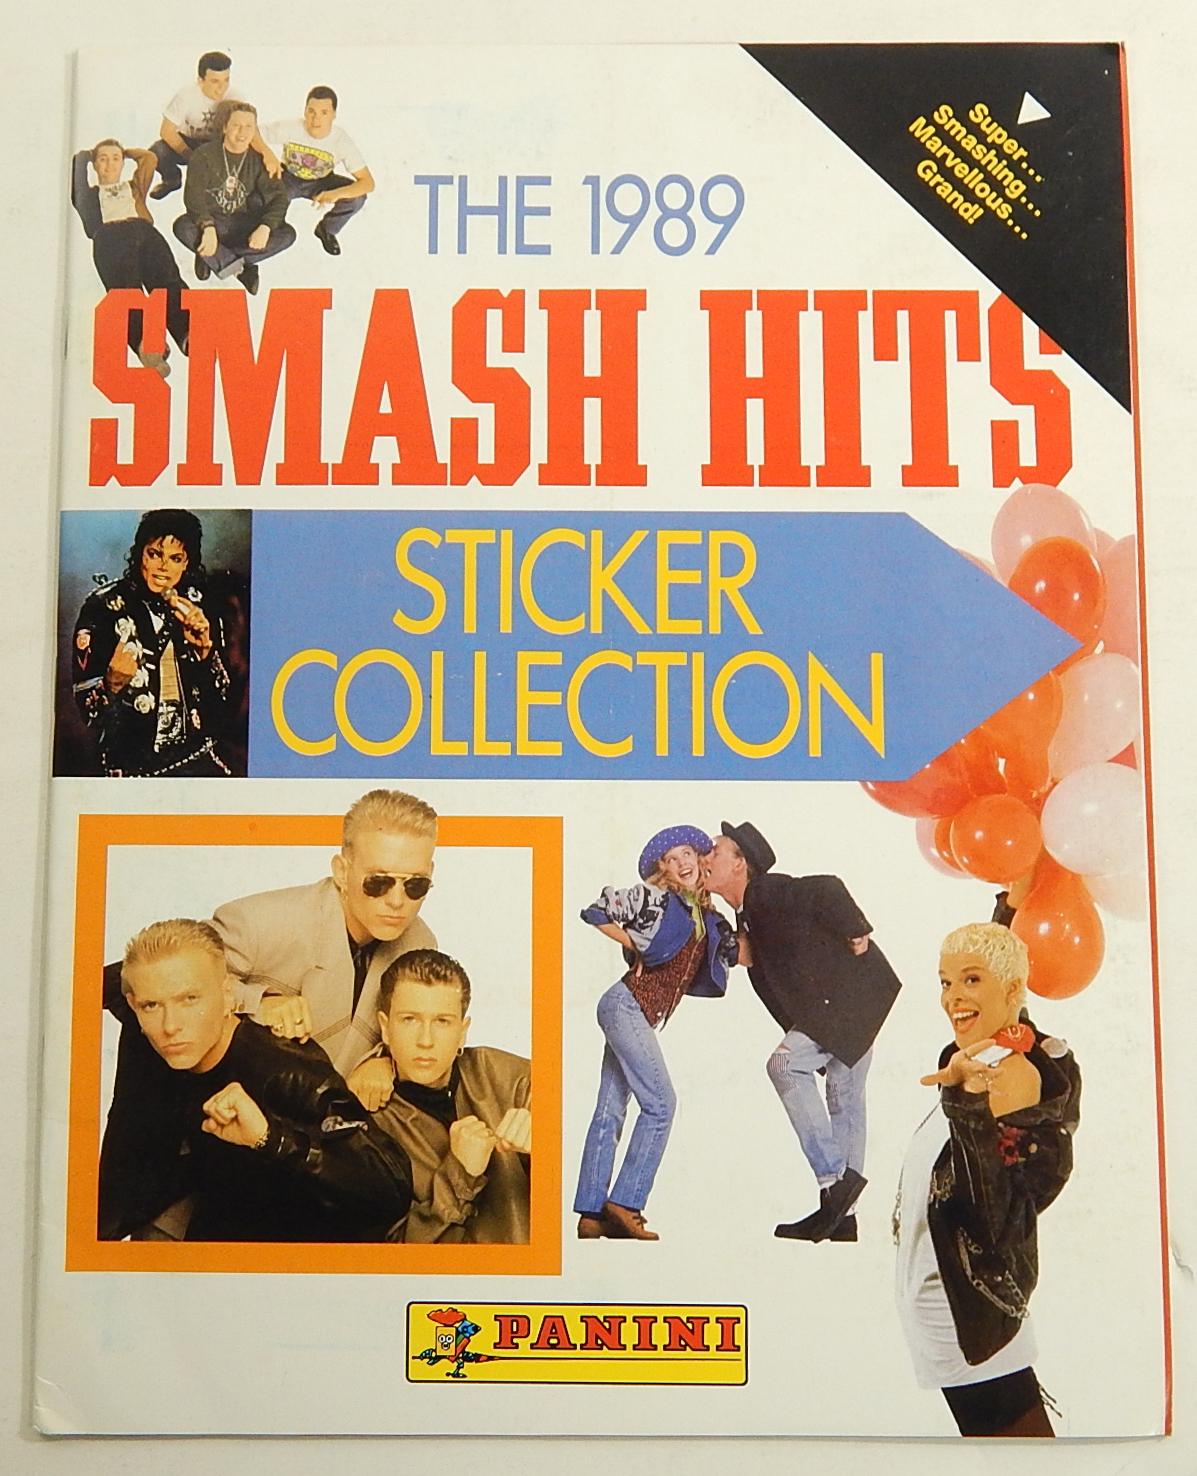 1989 smash hits sticker collection unused sticker album panini michael jackson ebay. Black Bedroom Furniture Sets. Home Design Ideas